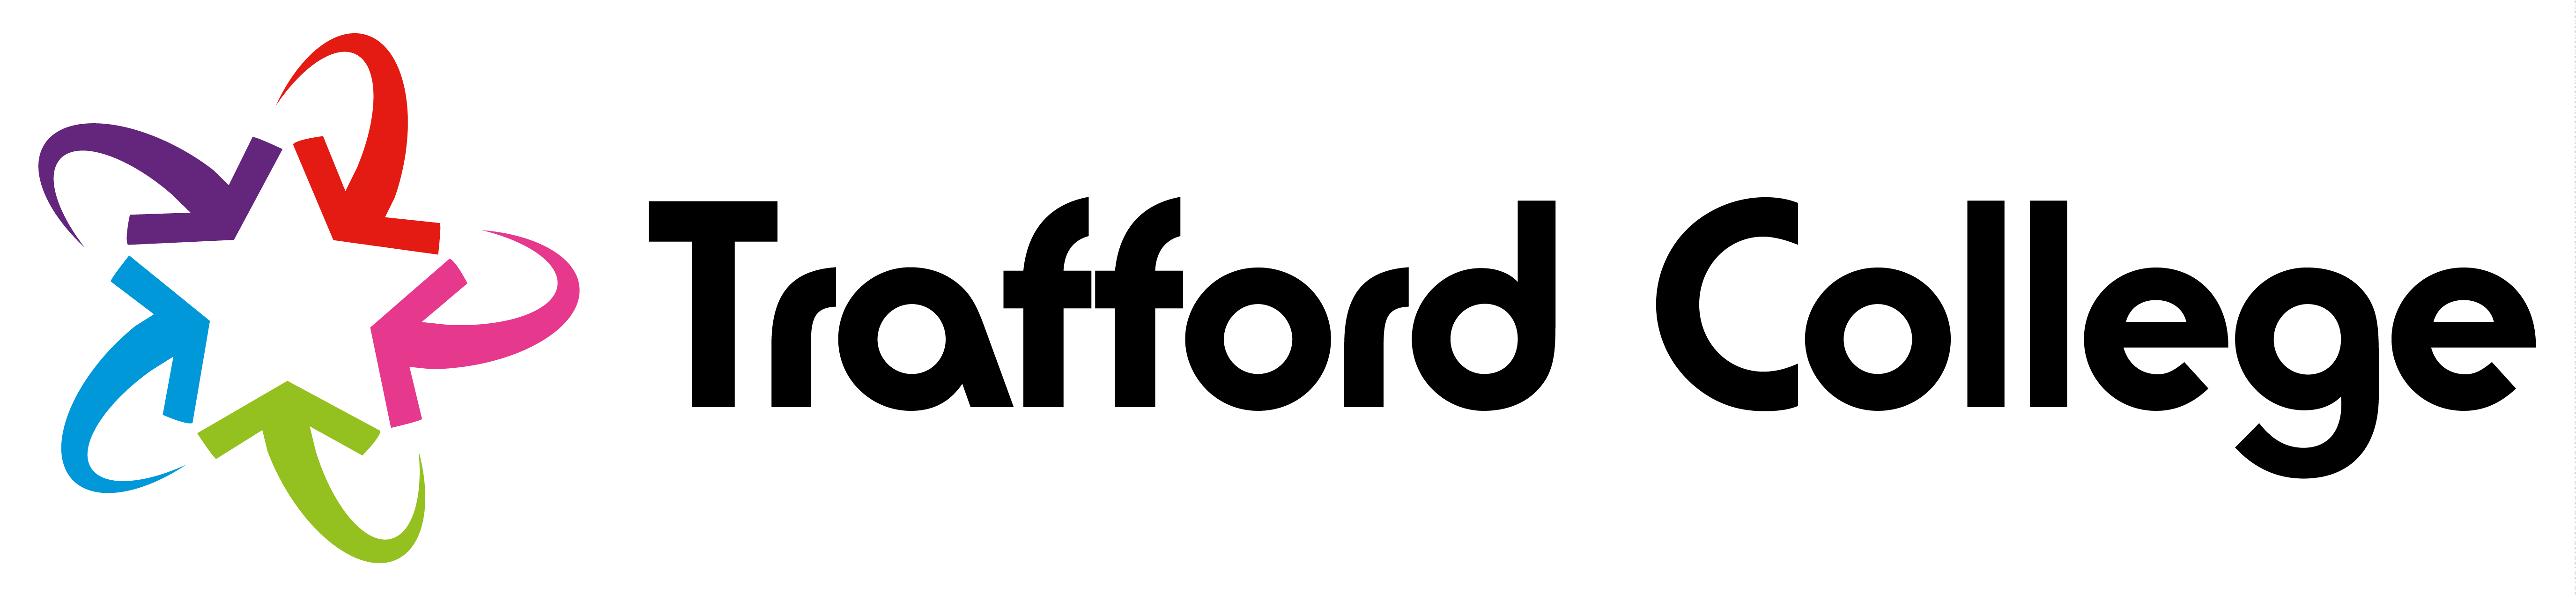 Jennifer Barnfield - Trafford college